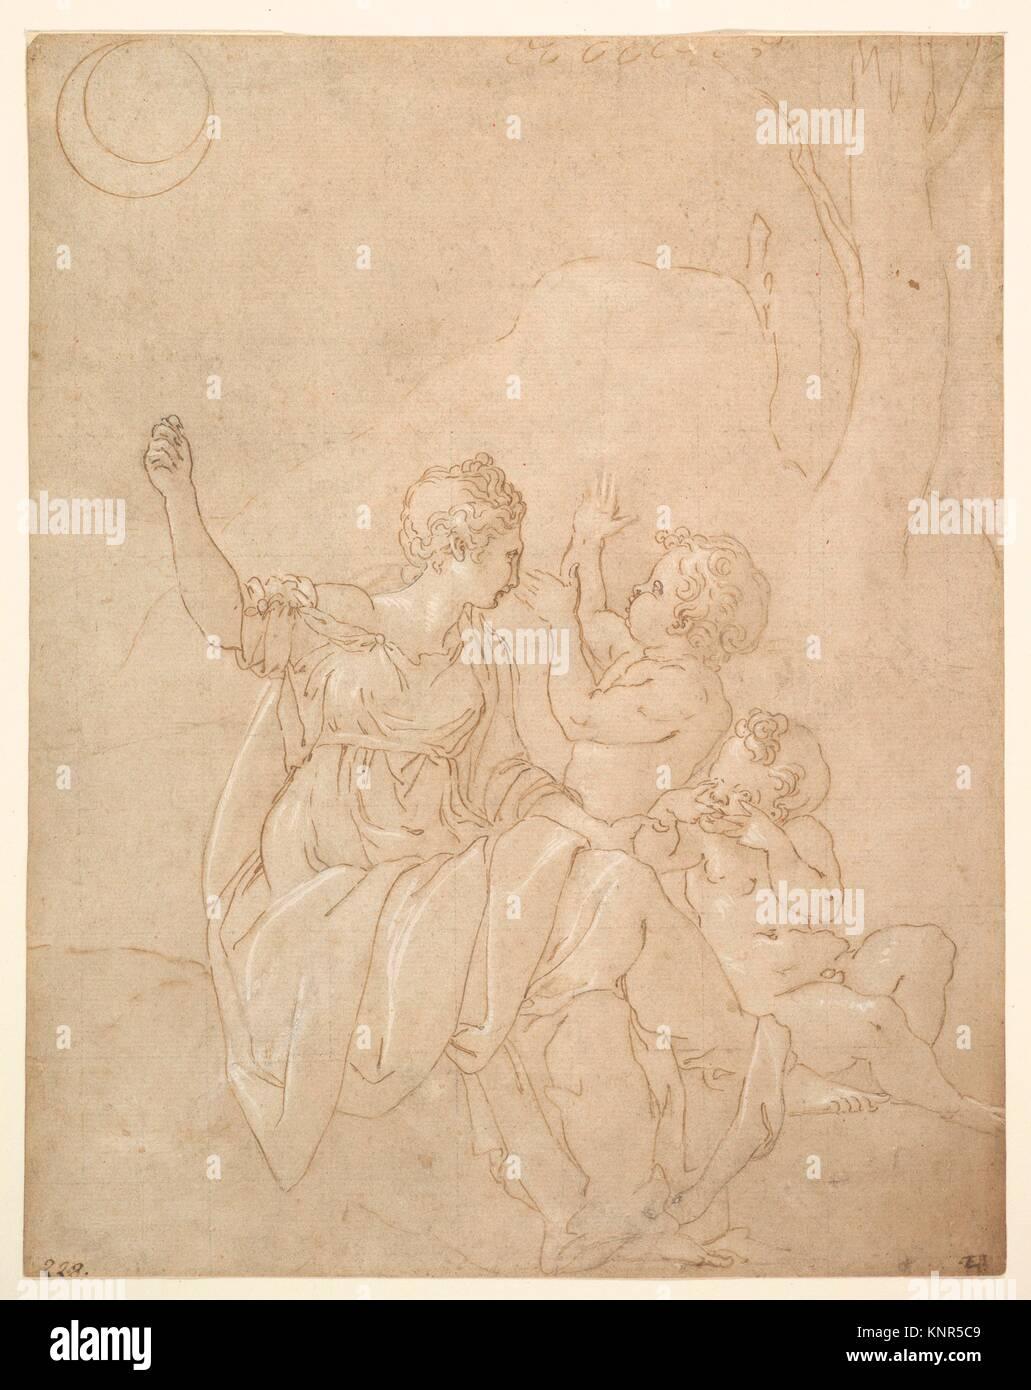 Classical Female Figure (Diana or Venus) with Two Infants. Artist: Francesco Primaticcio (Italian, Bologna 1504/5 - Stock Image